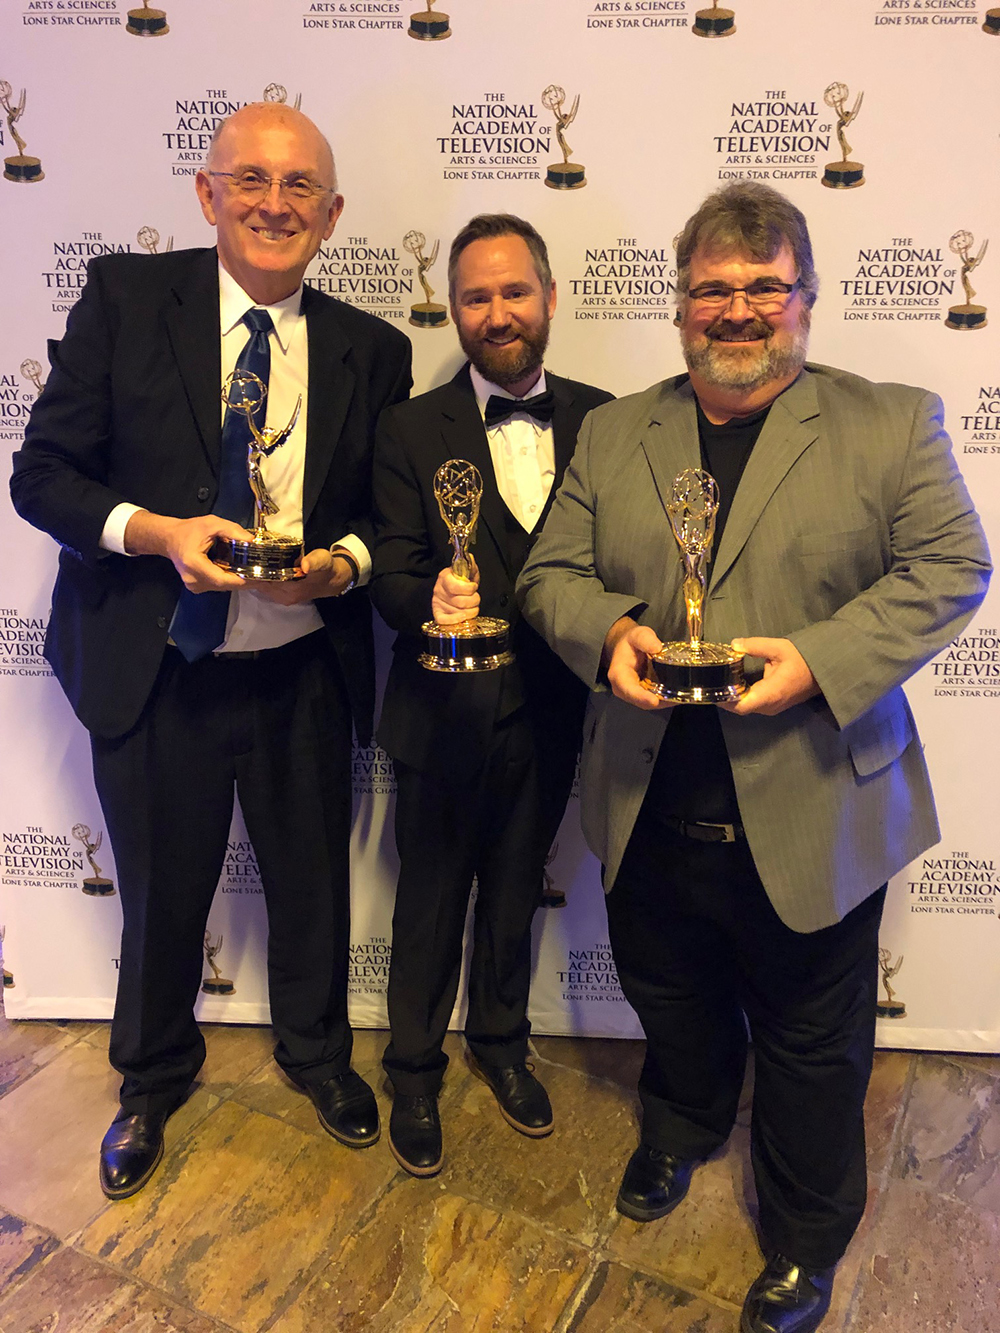 SWAU communication department receives an Emmy award on Nov. 10, 2018